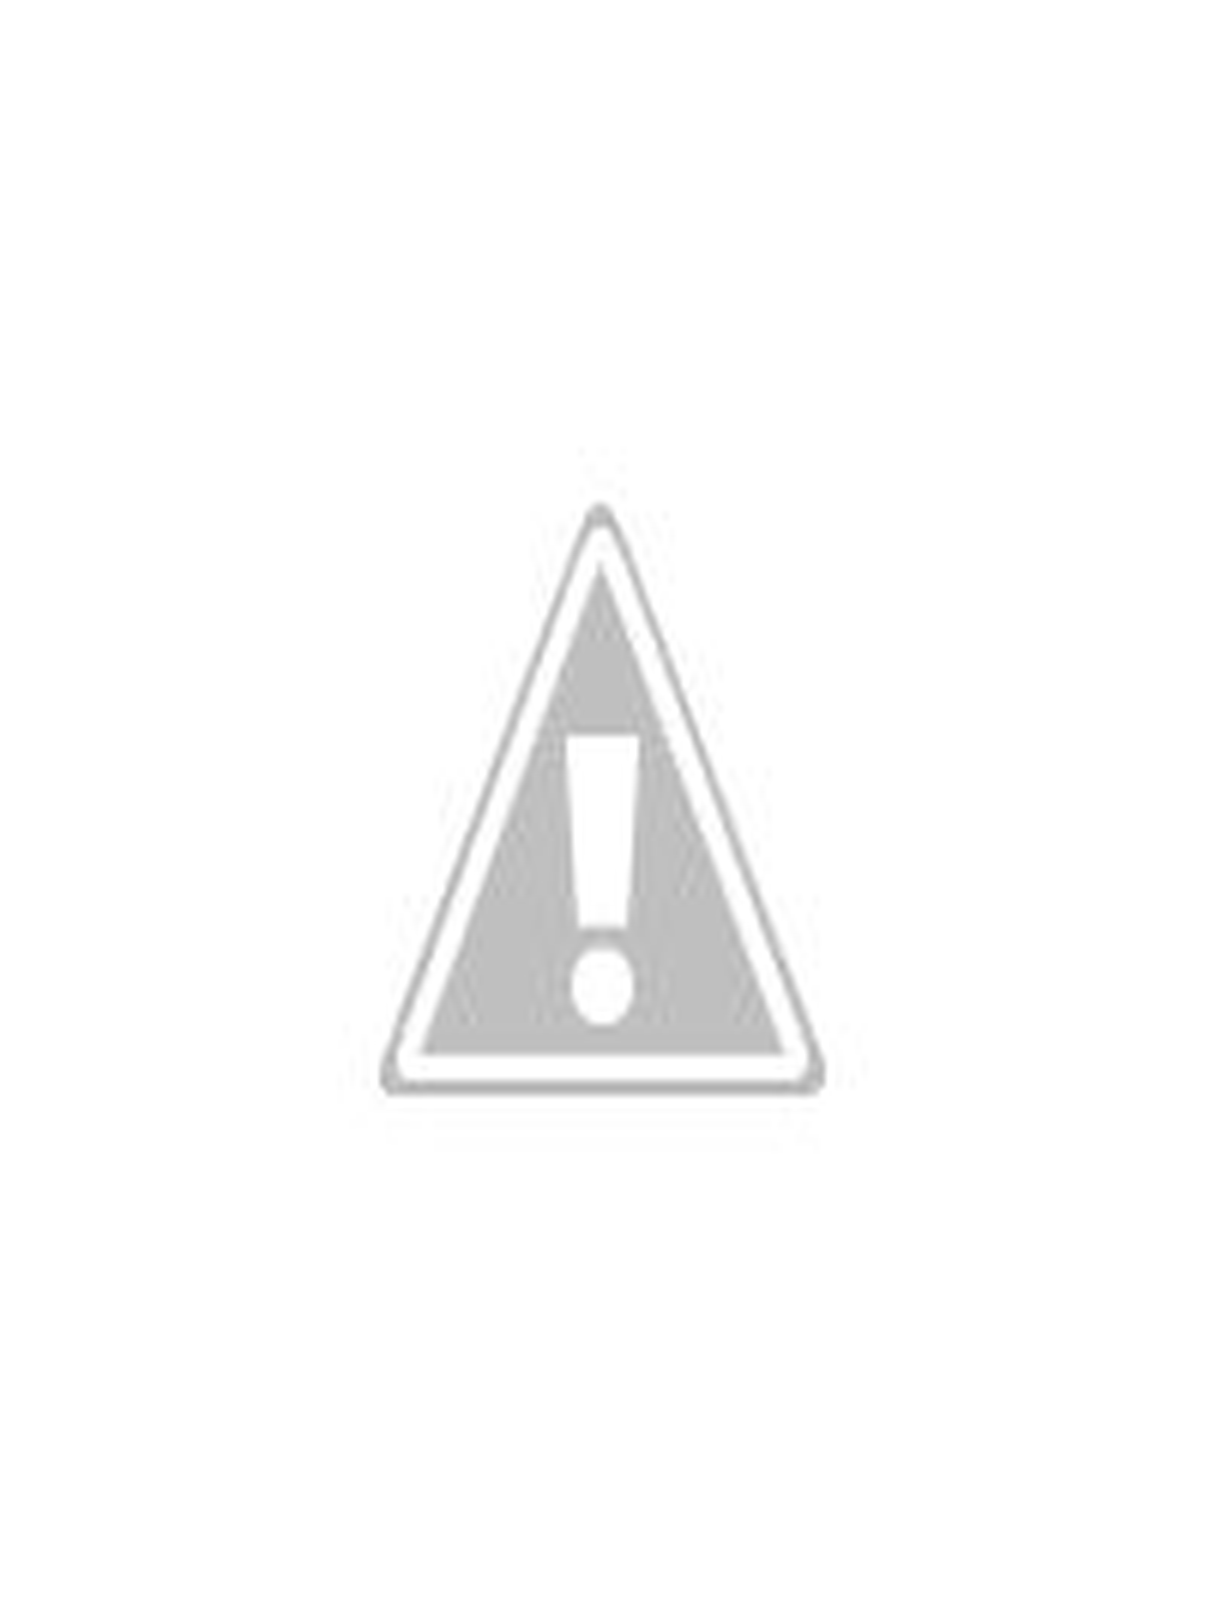 Como preparar ocopa receta sencilla recetas de comida for Resetas para comidas